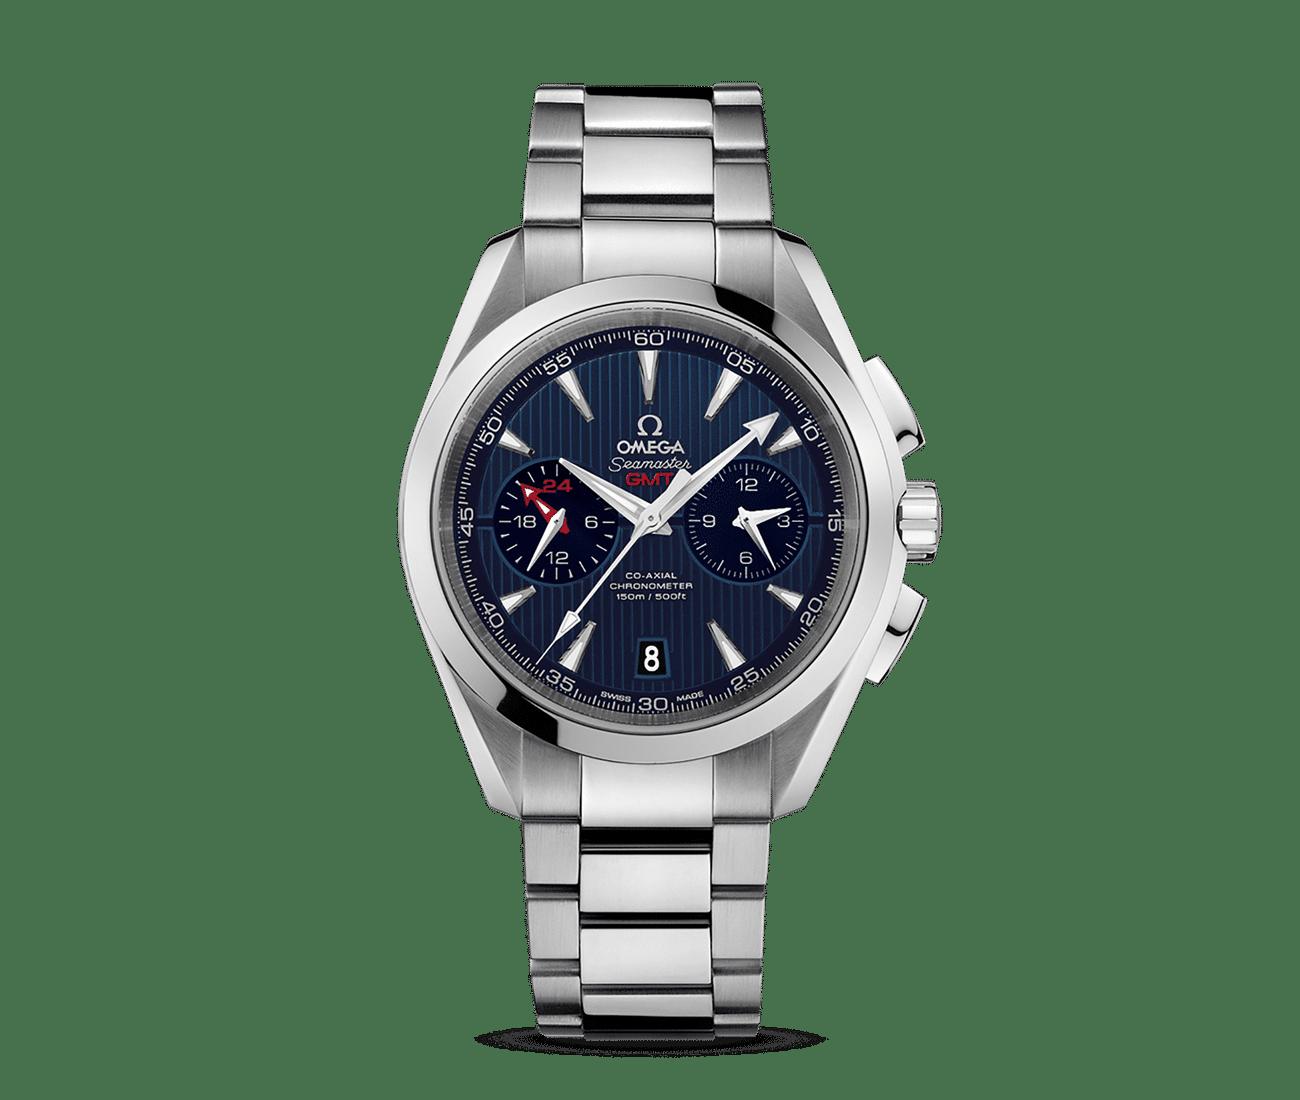 Aqua Terra 150 M Omega Co-axial Gmt Chronograph